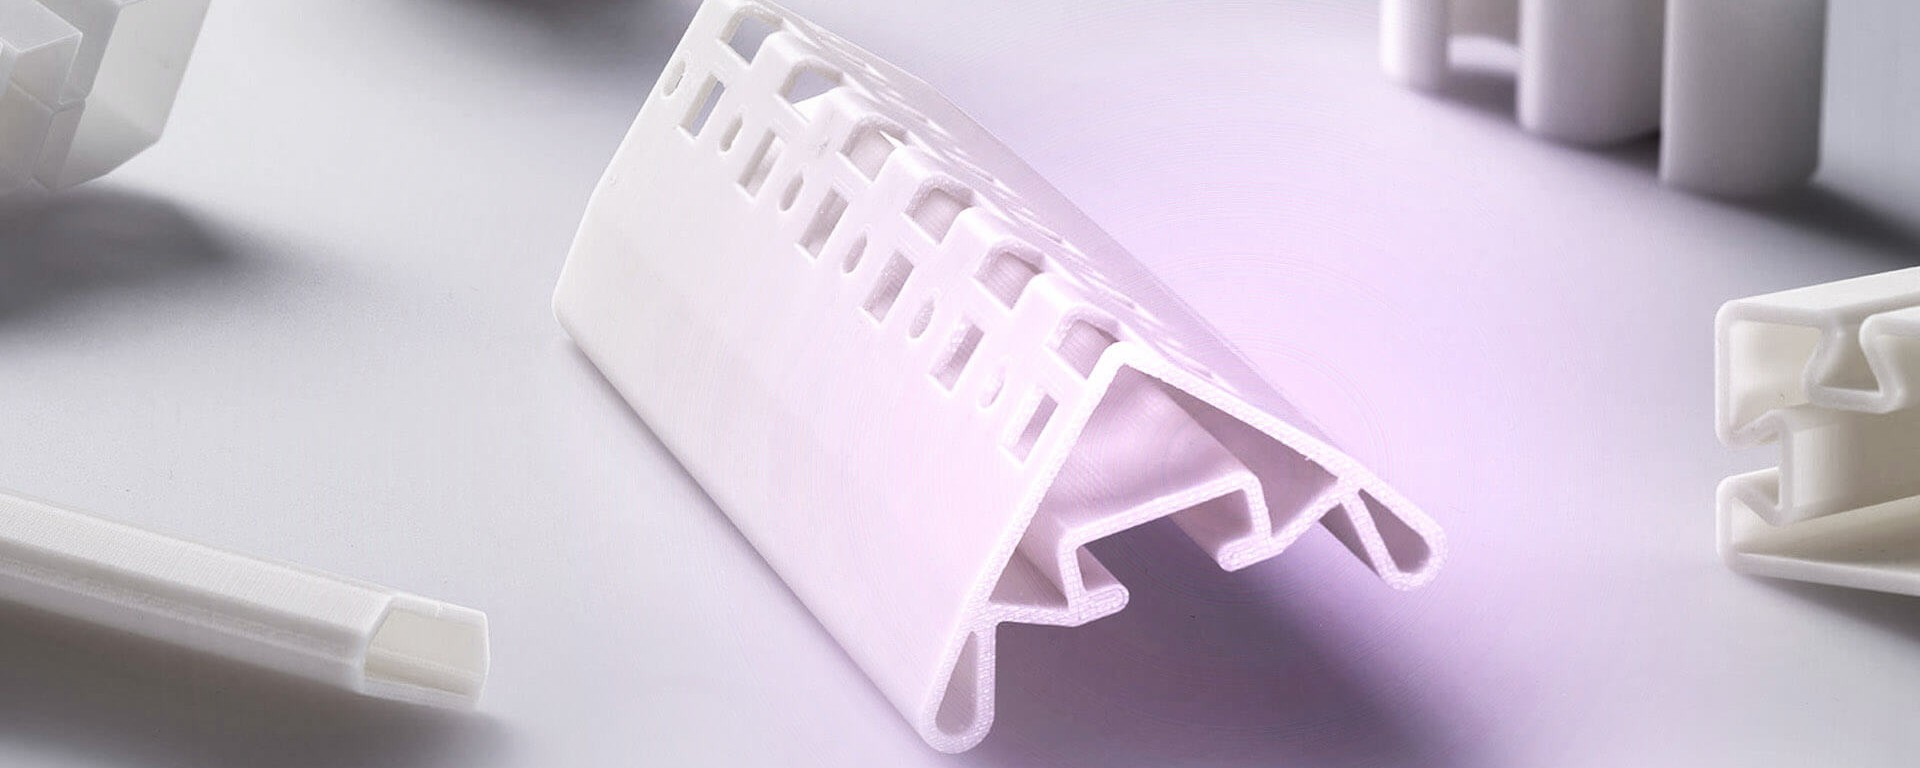 Welser Profile Rapid Prototyping